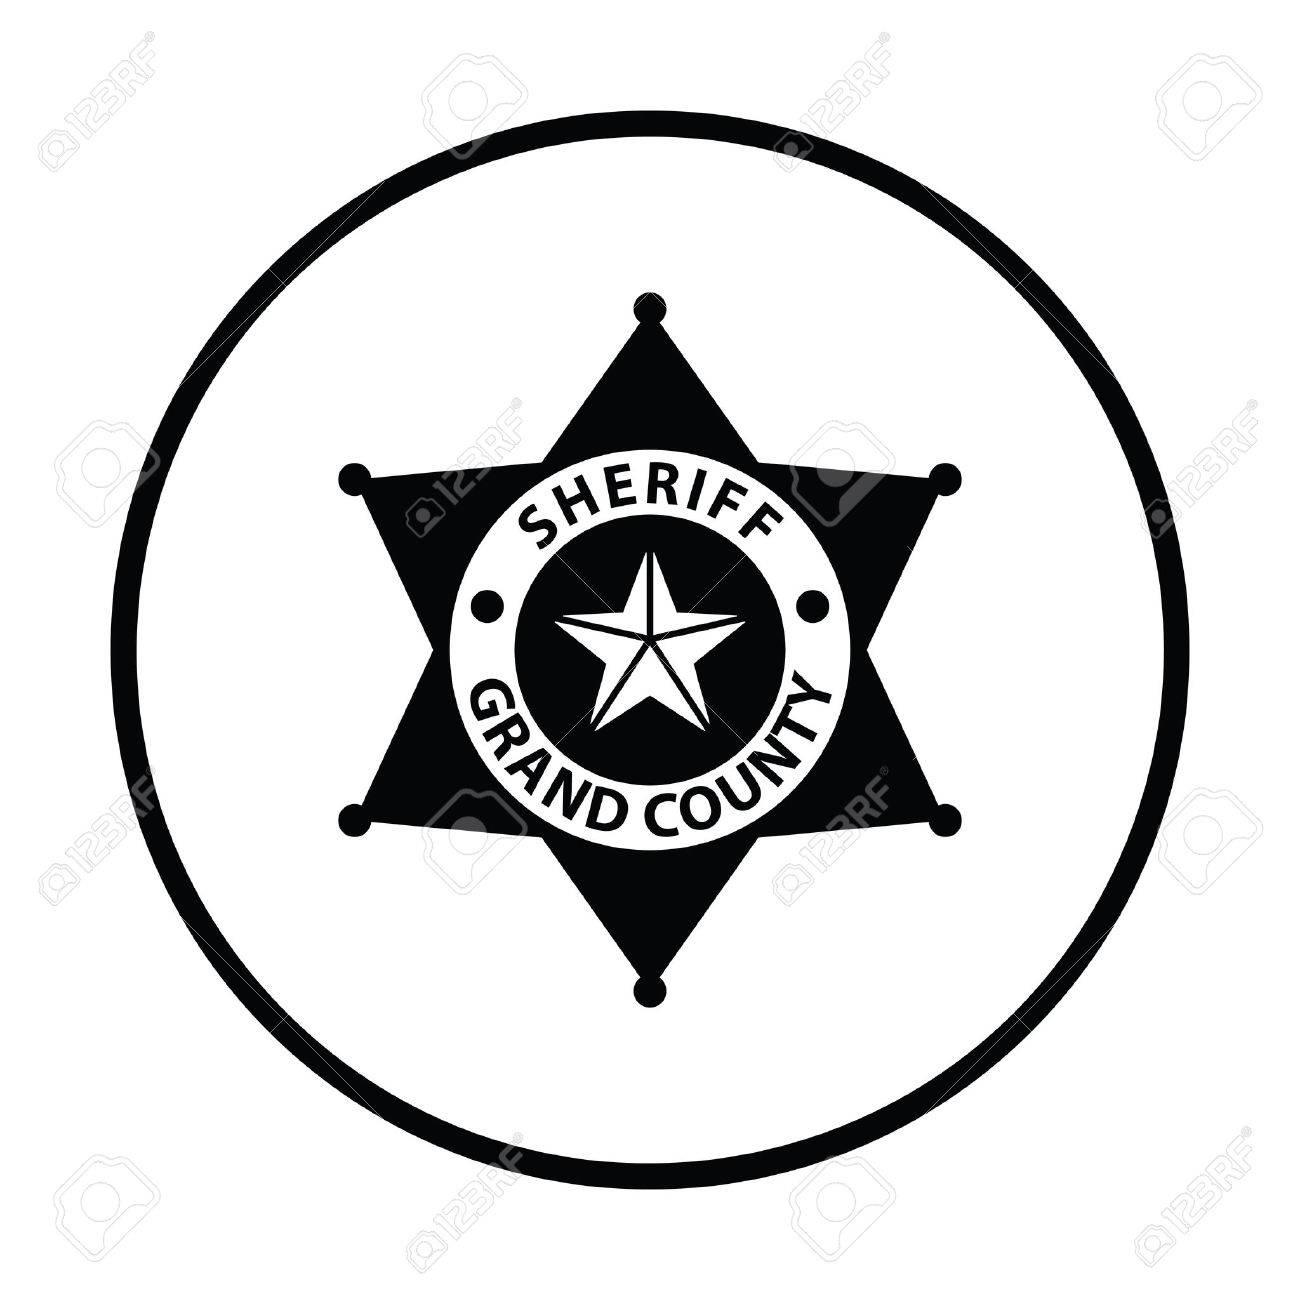 Sheriff badge icon. Thin circle design. Vector illustration. - 60984312